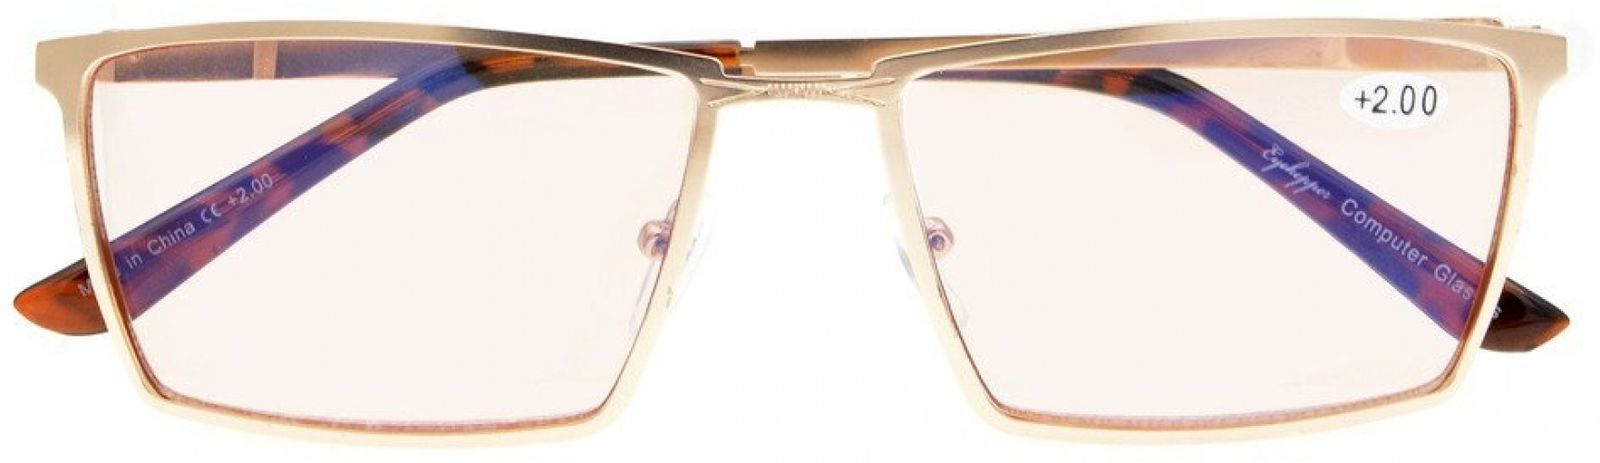 Eyekepper 4-Pack Mens Reading Glasses Spring Hinges Included Tinted Lens +0.75 image 5